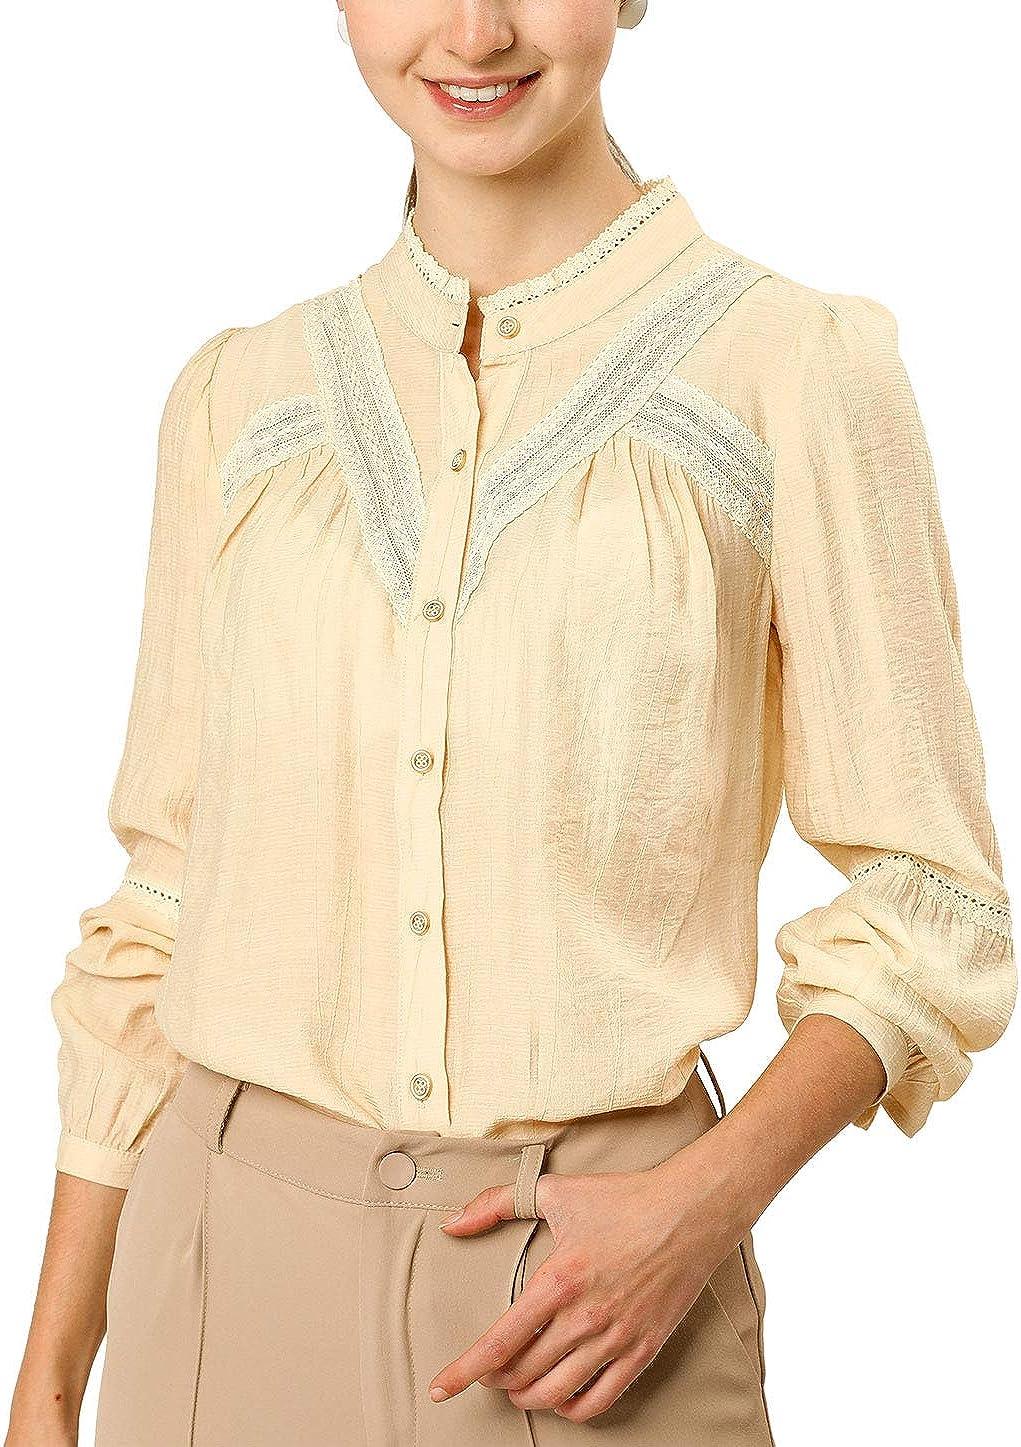 Allegra K Women's Spring Long Sleeve Blouse Boho Casual Button Down Shirt